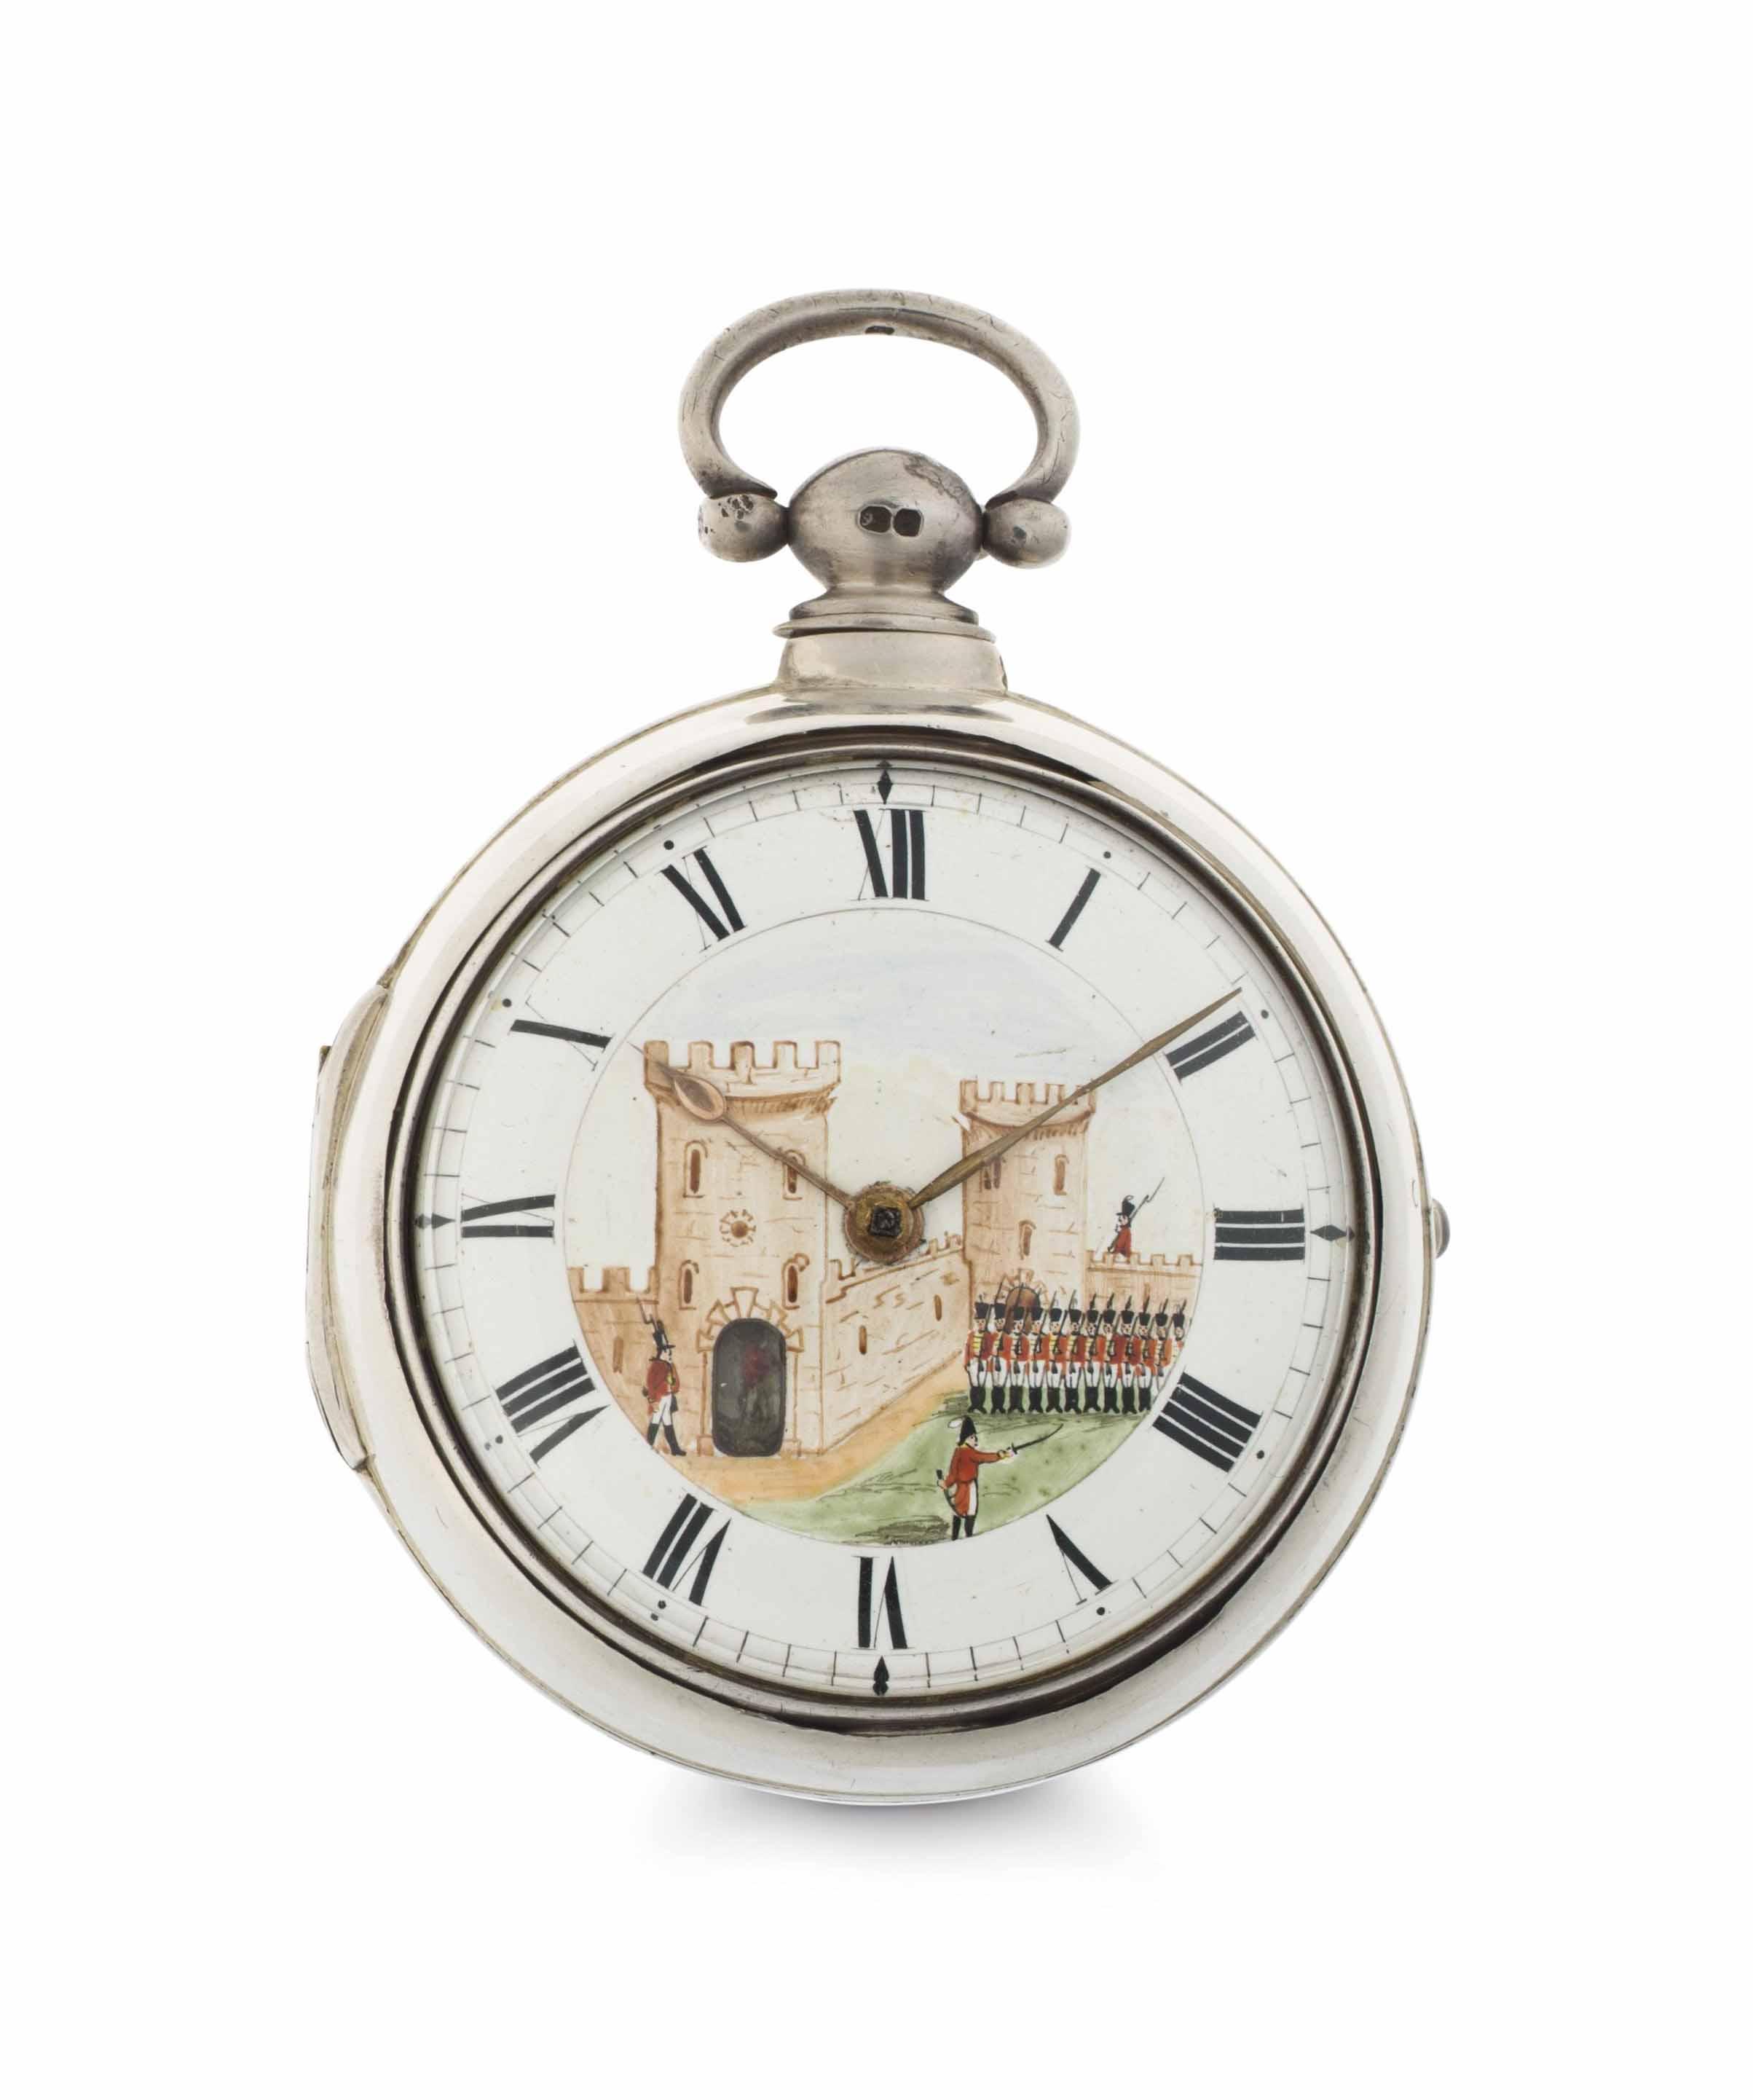 John Burton. A Silver and Enamel Pair Case Keywound Verge Watch with Automaton